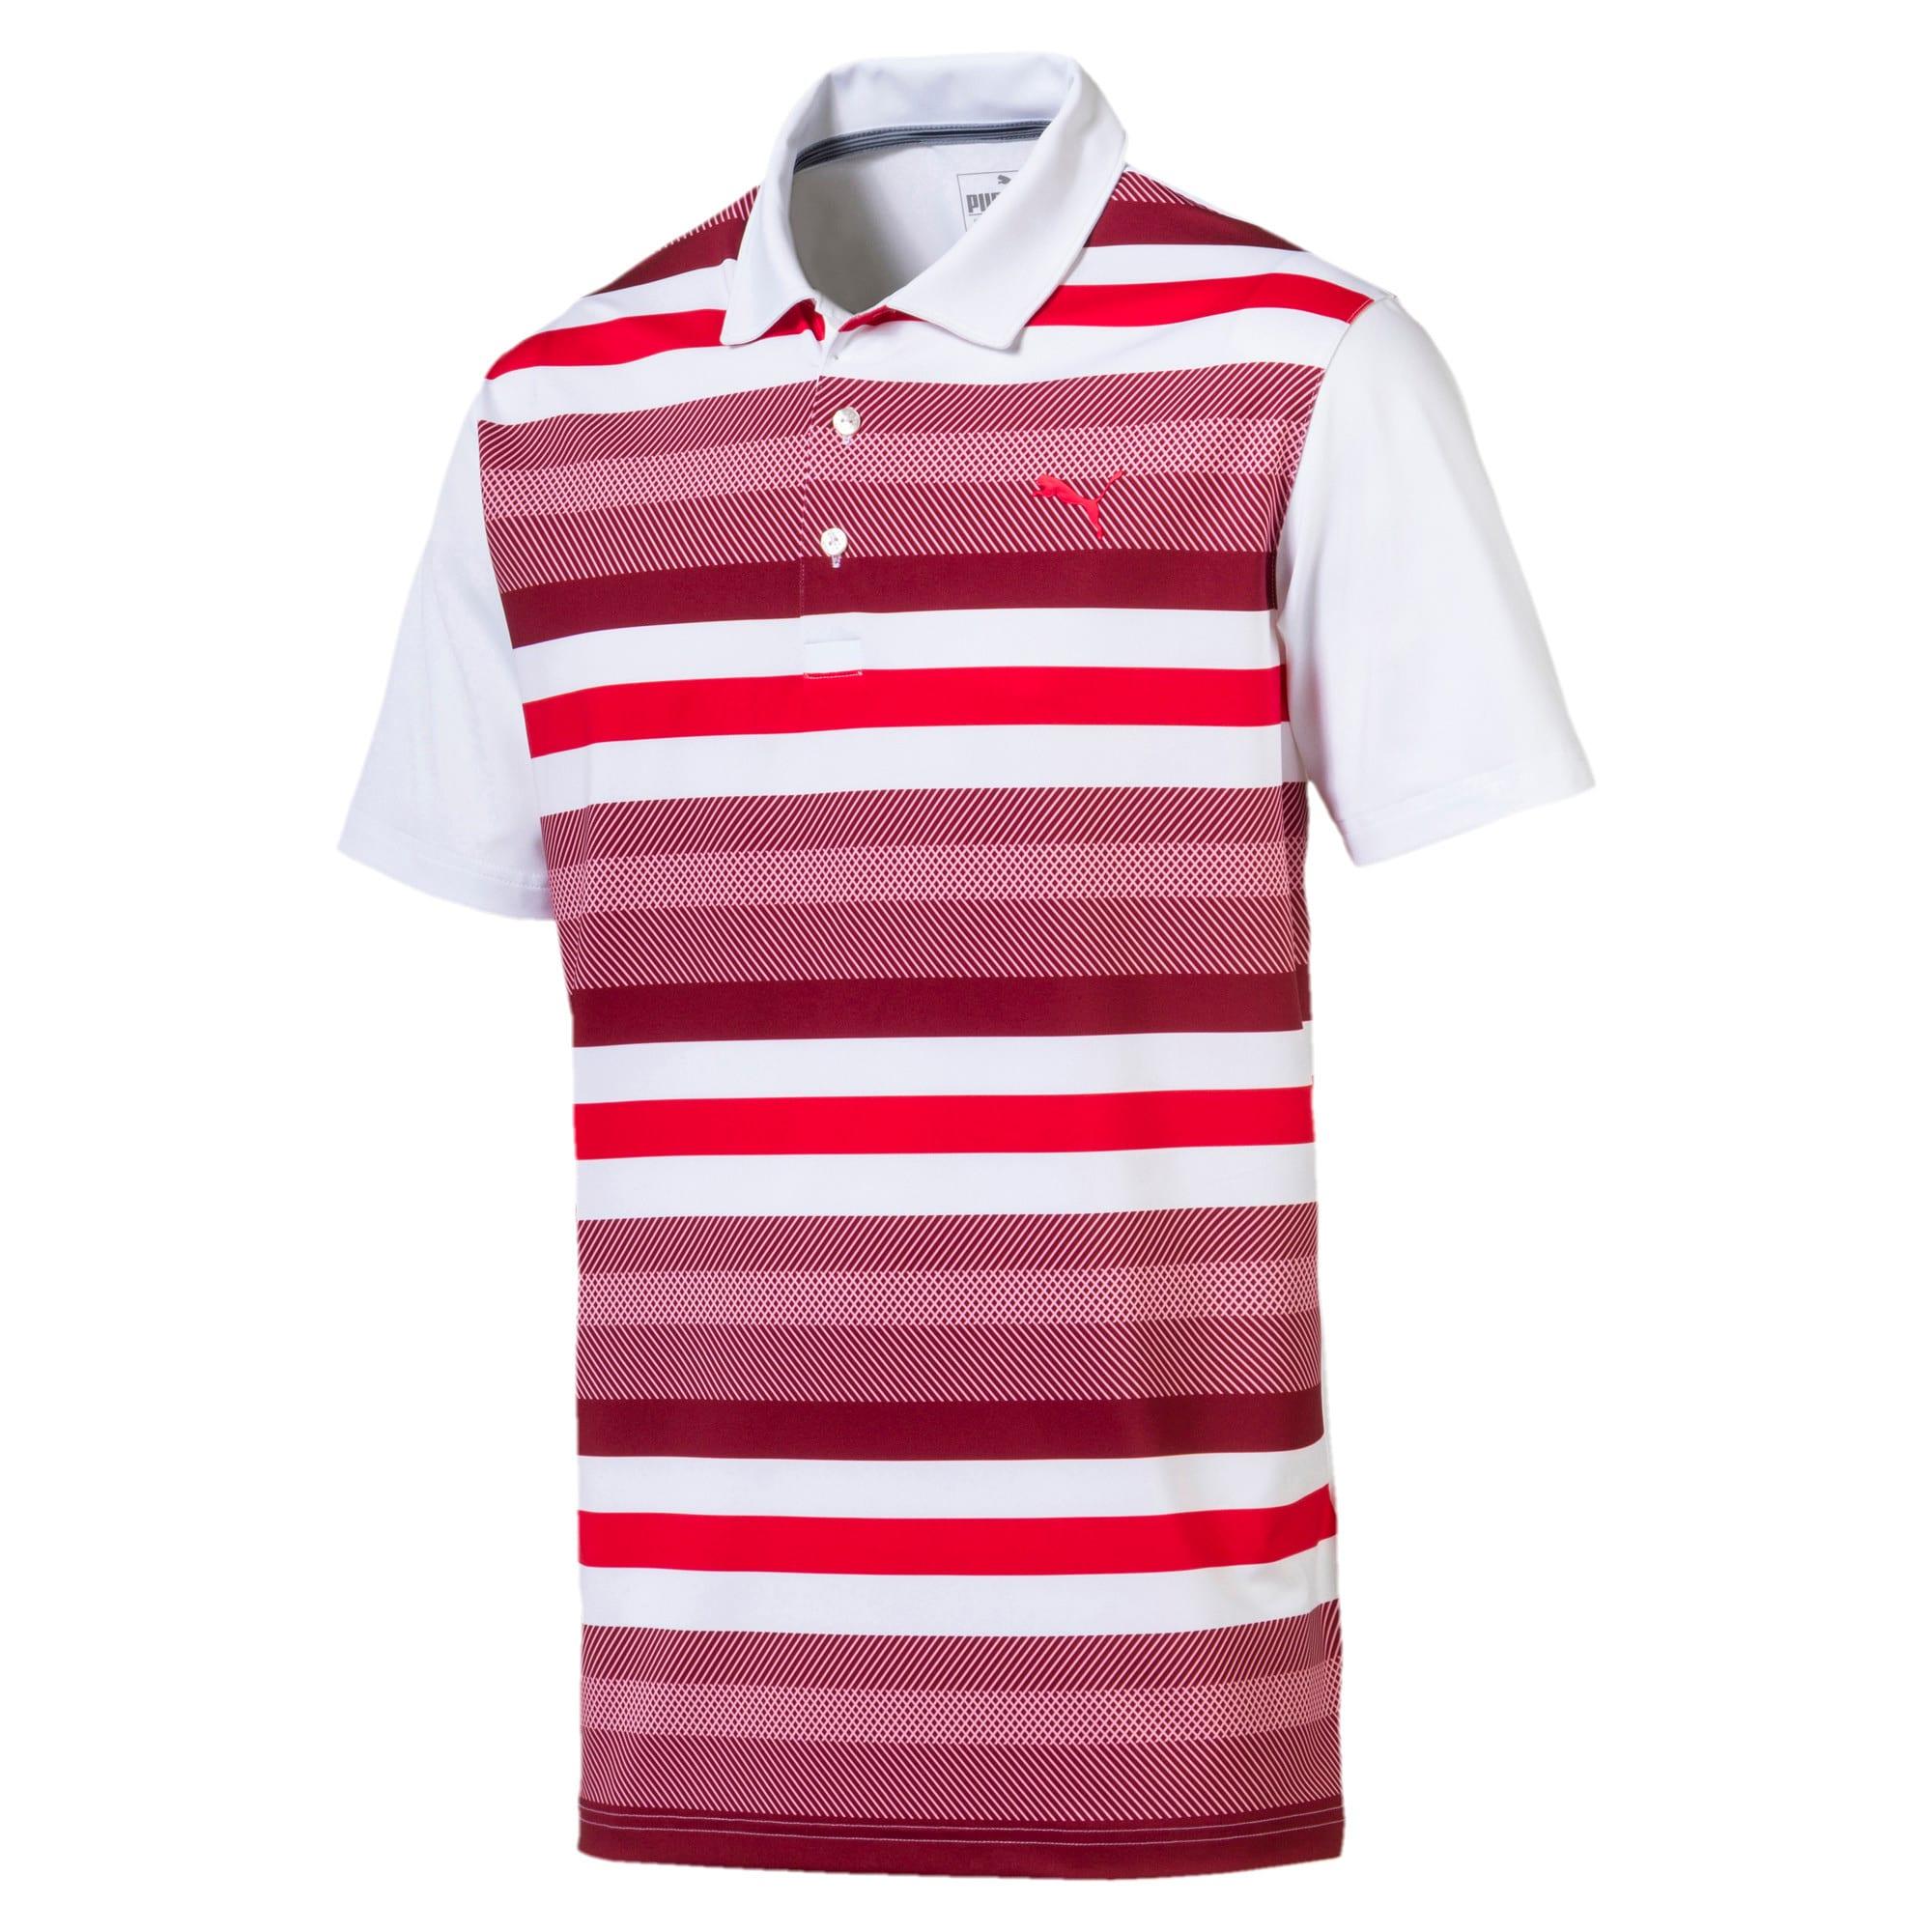 Thumbnail 4 of Golf Men's Turf Stripe Polo, Bright White-Pomegranate, medium-IND